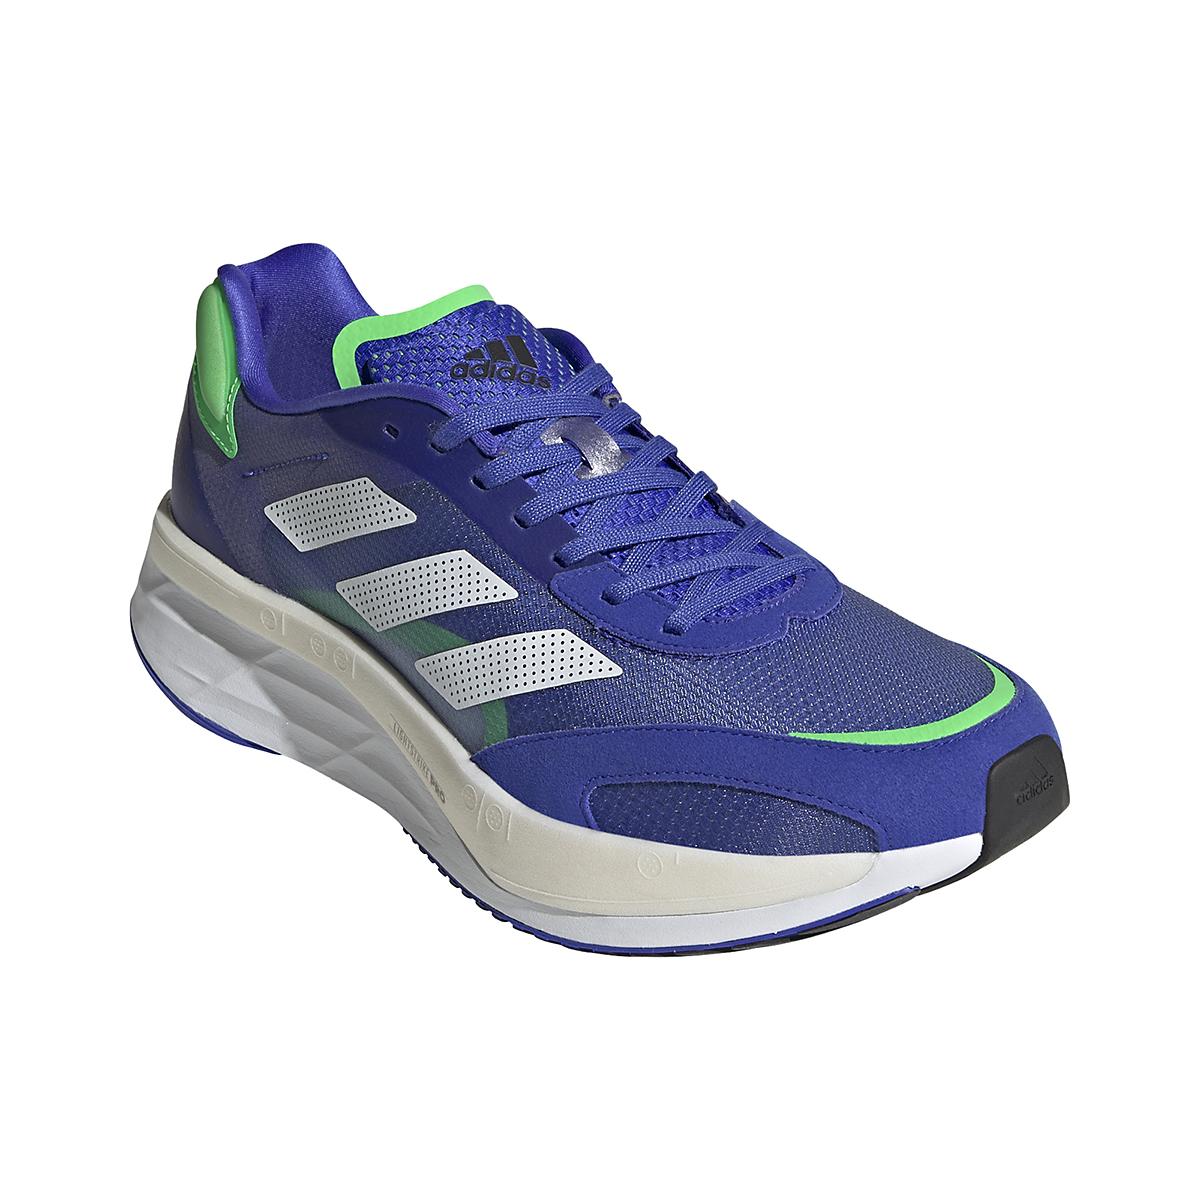 Men's Adidas Adizero Boston 10 Running Shoe - Color: Sonic Ink/White/Screaming Green - Size: 6.5 - Width: Regular, Sonic Ink/White/Screaming Green, large, image 3